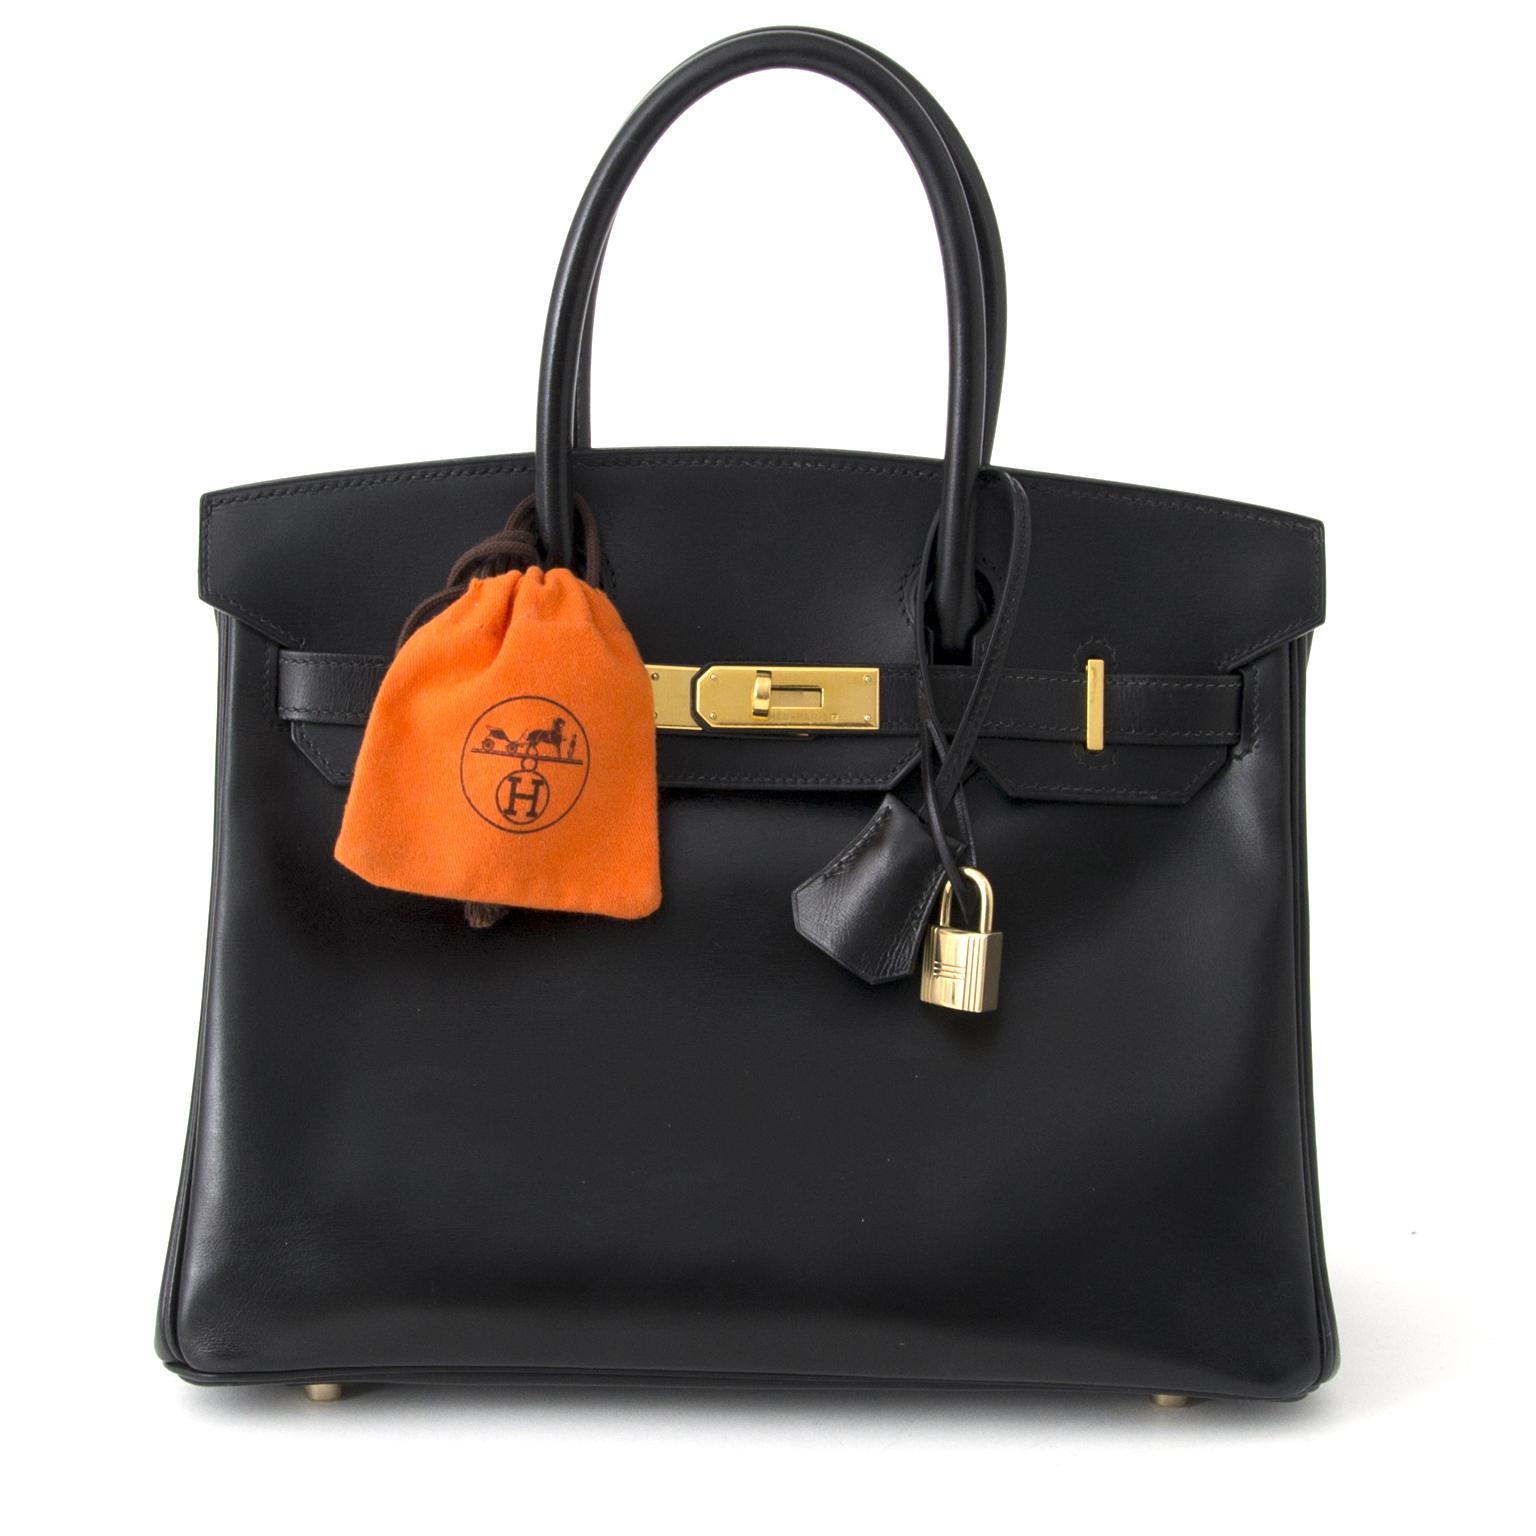 ... luxury handbag Hermes Birkin 30 Black Box Calf GHW real real worldwide  shipping  6a82579451da5